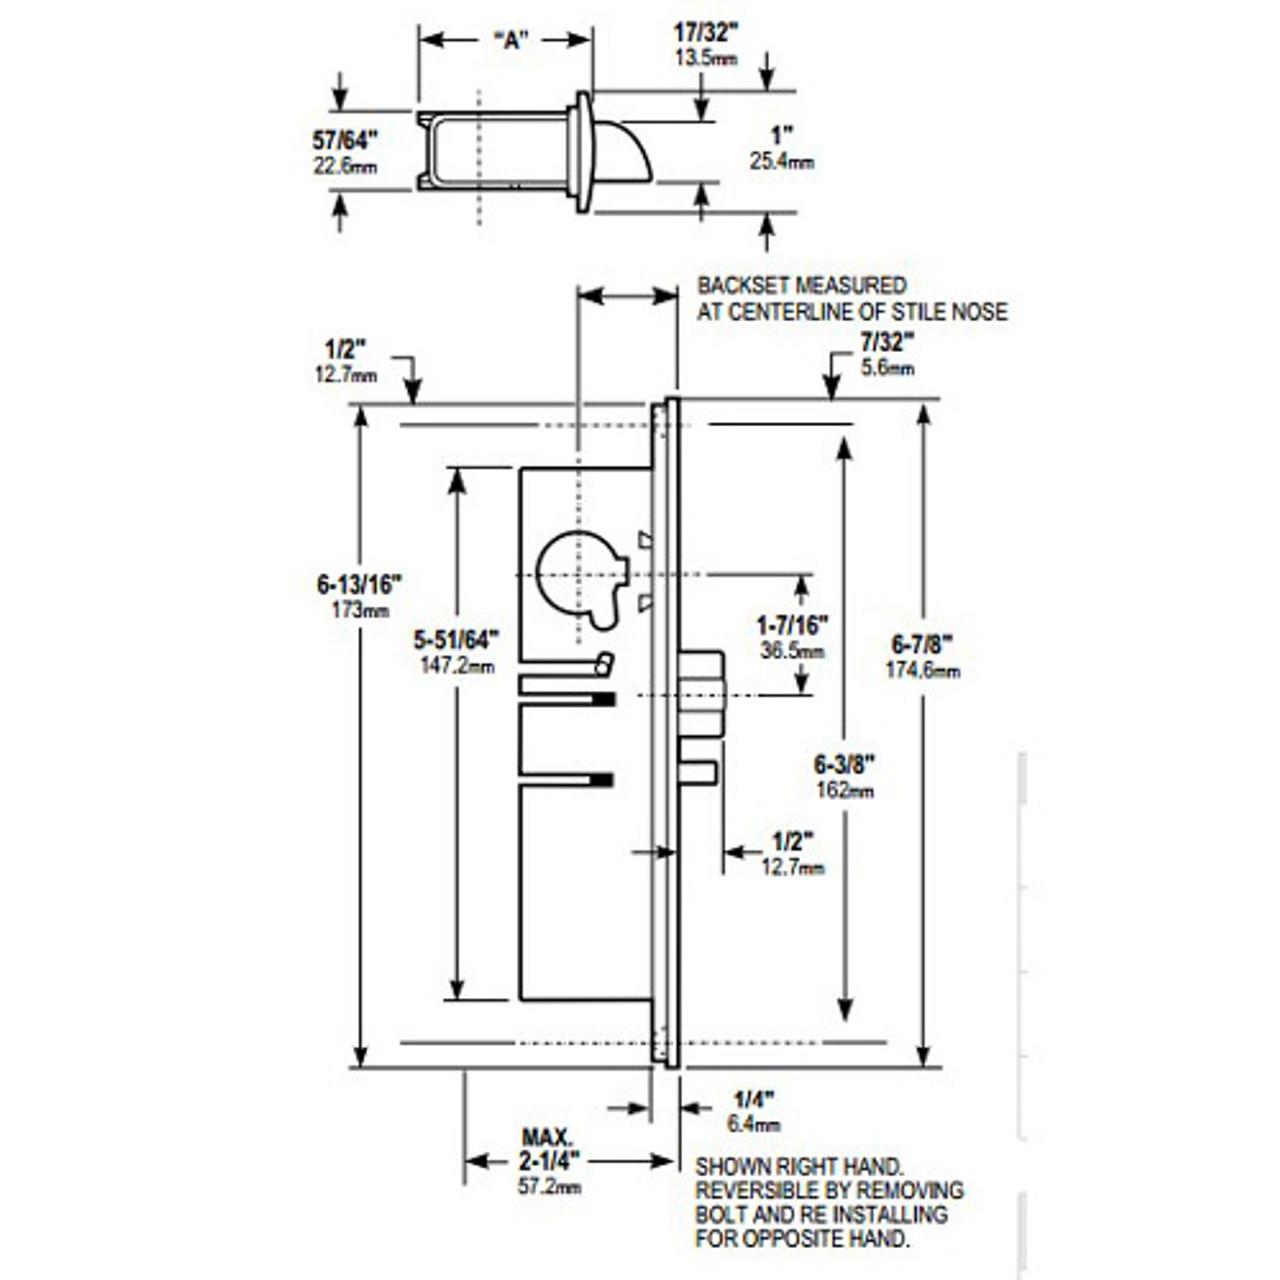 4512-26-201-313 Adams Rite Standard Deadlatch Dimensional View